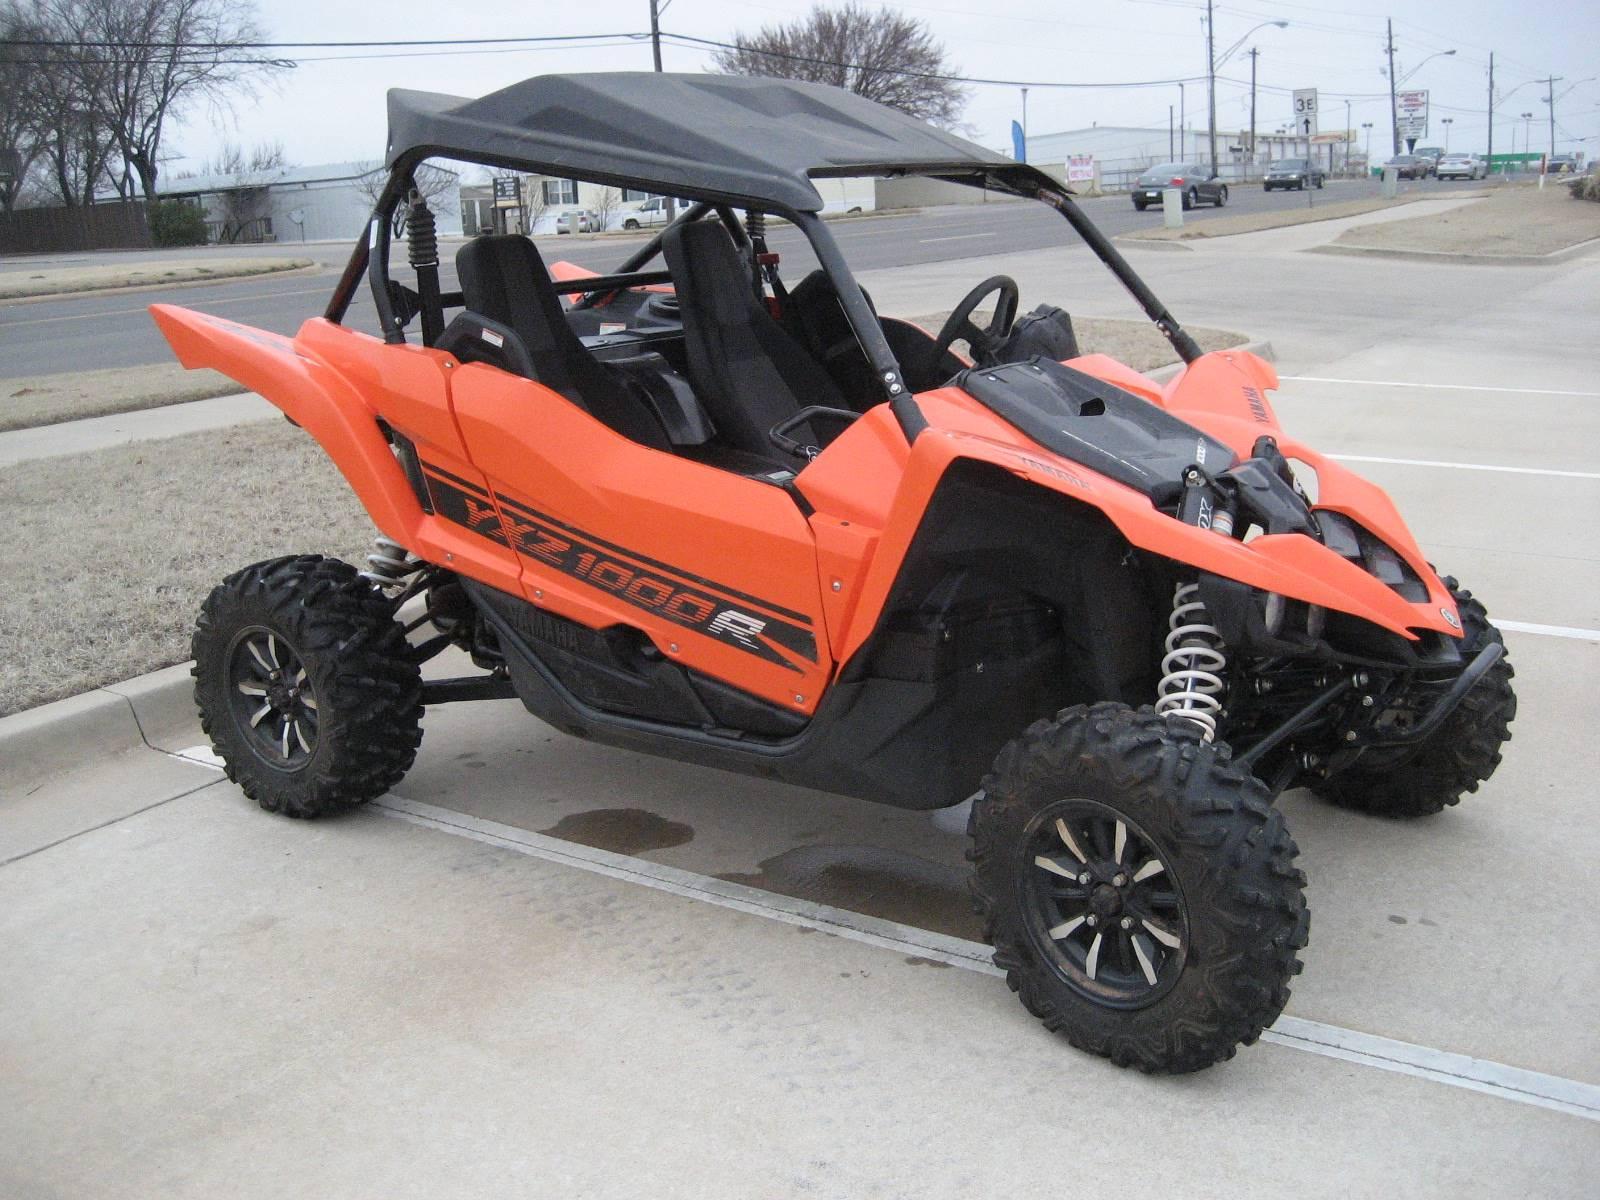 2016 Yamaha Yxz1000r In Shawnee Oklahoma